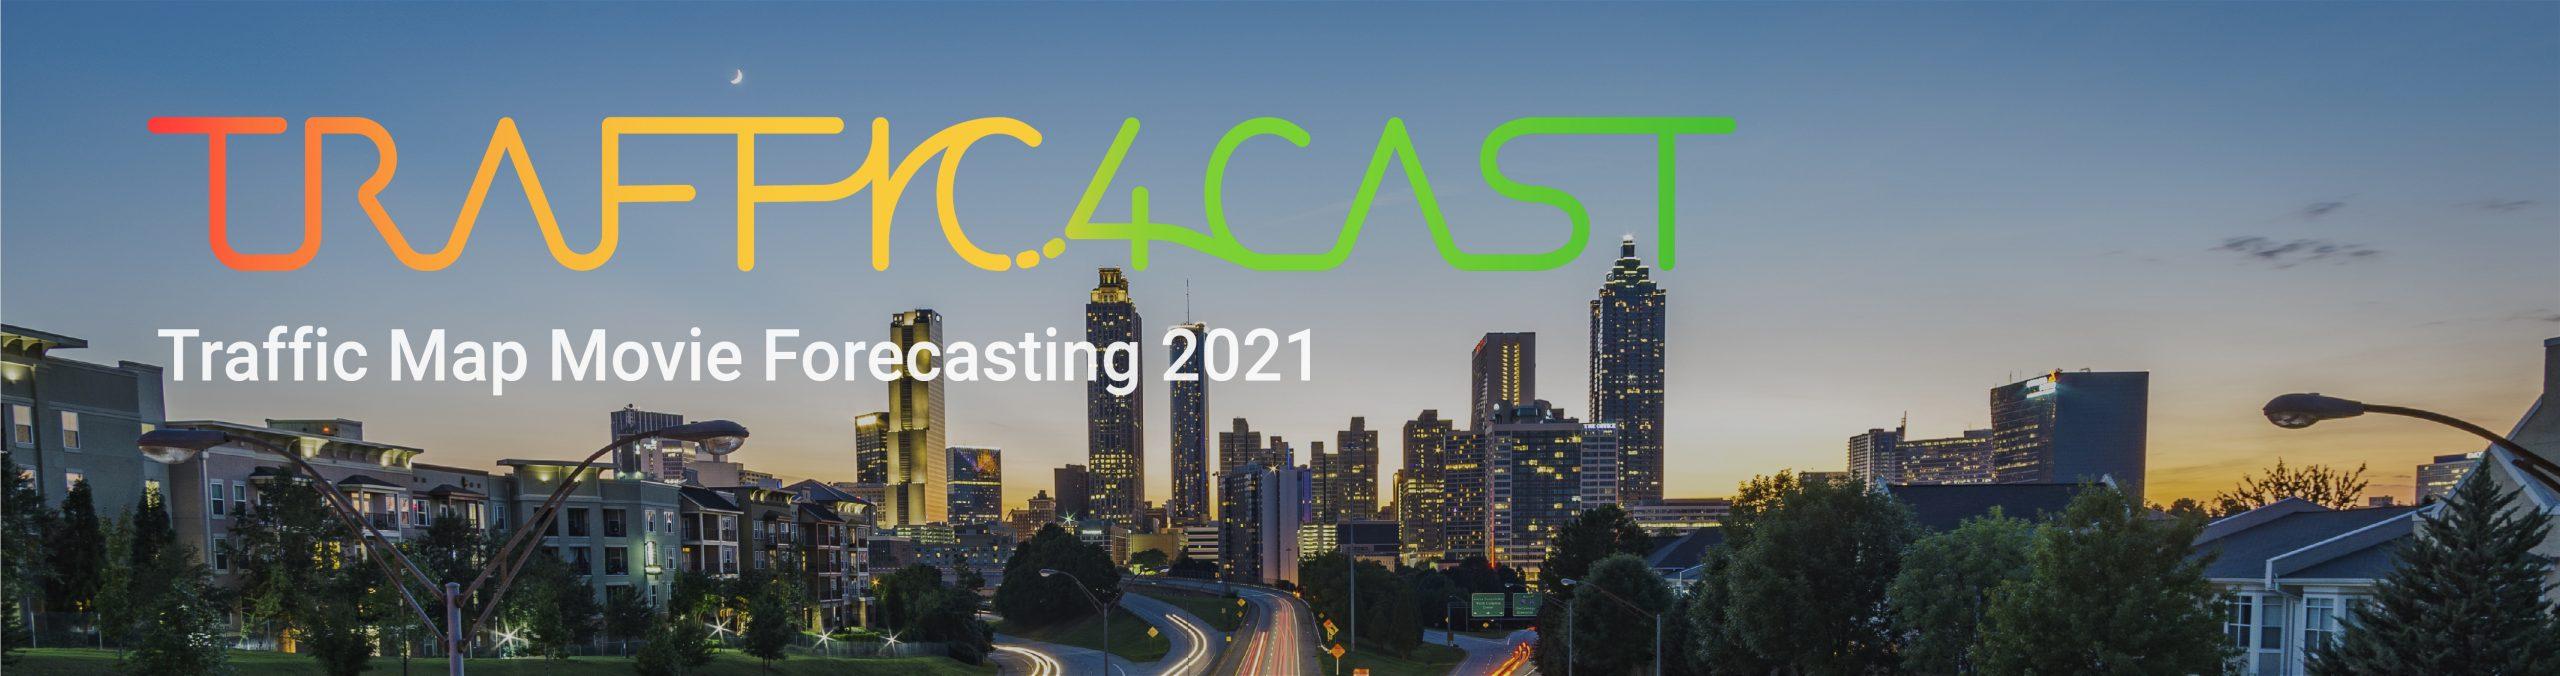 Traffic4cast 2021